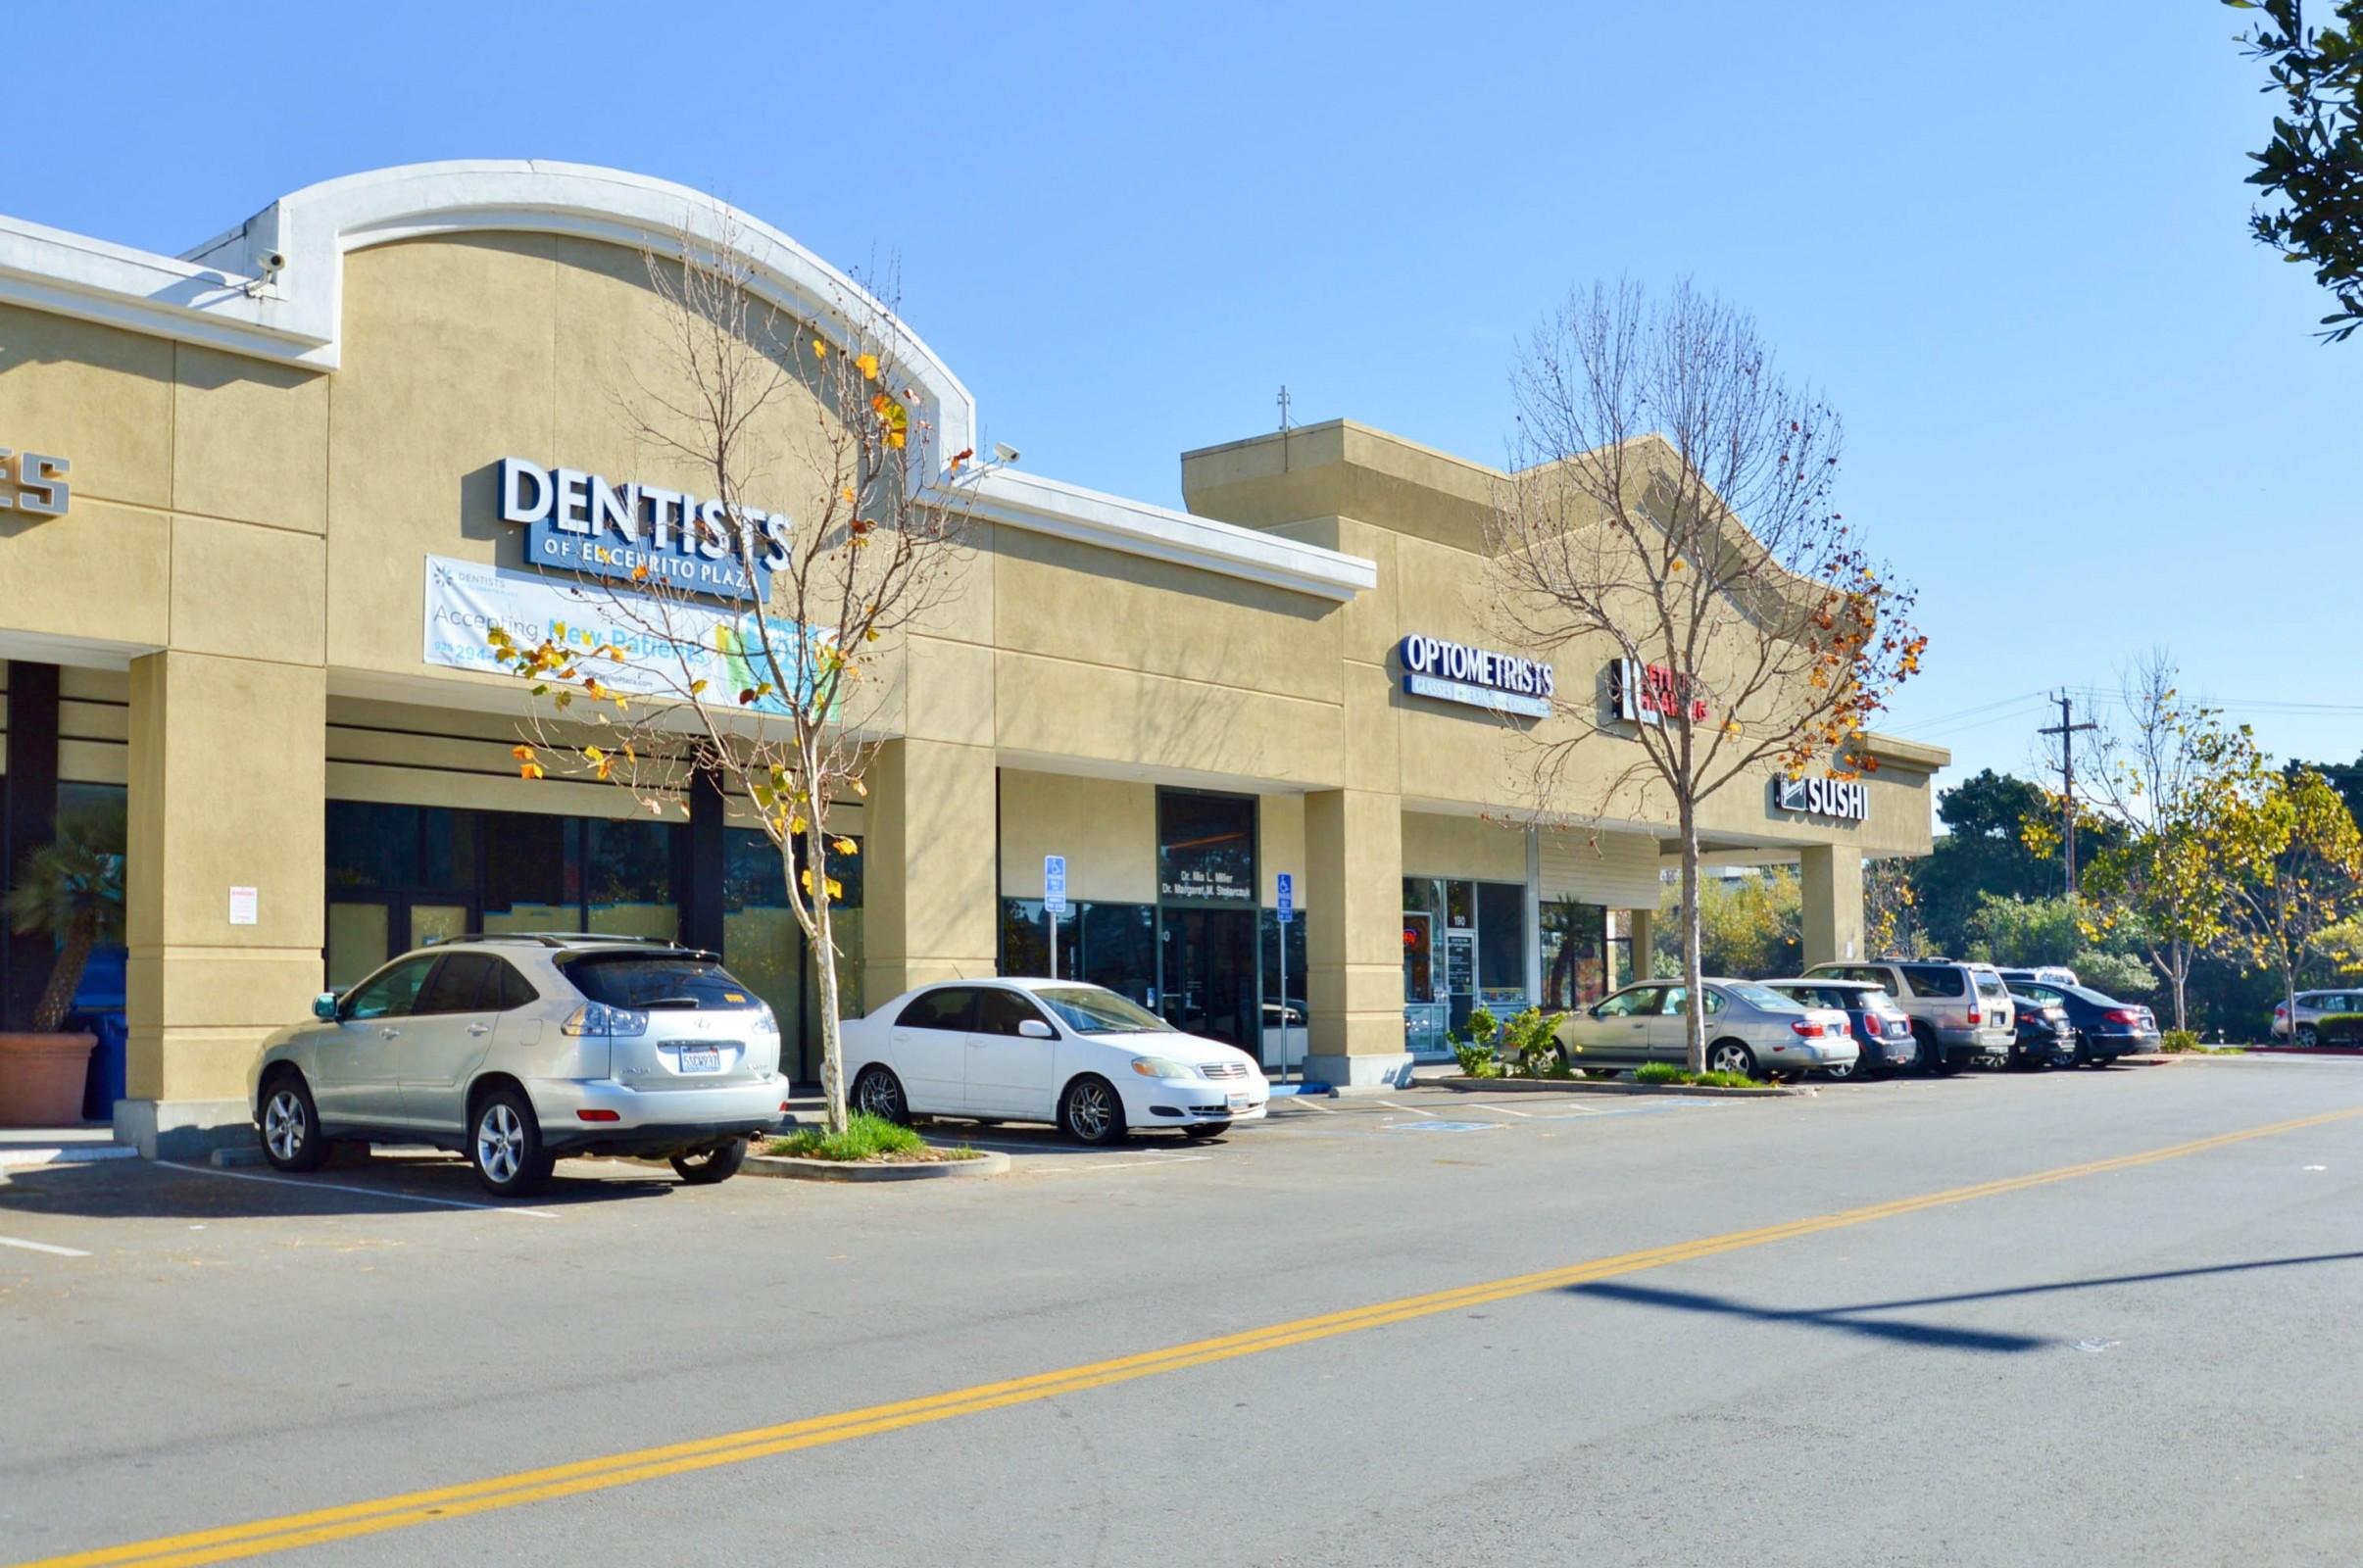 Dentists of El Cerrito Plaza image 1